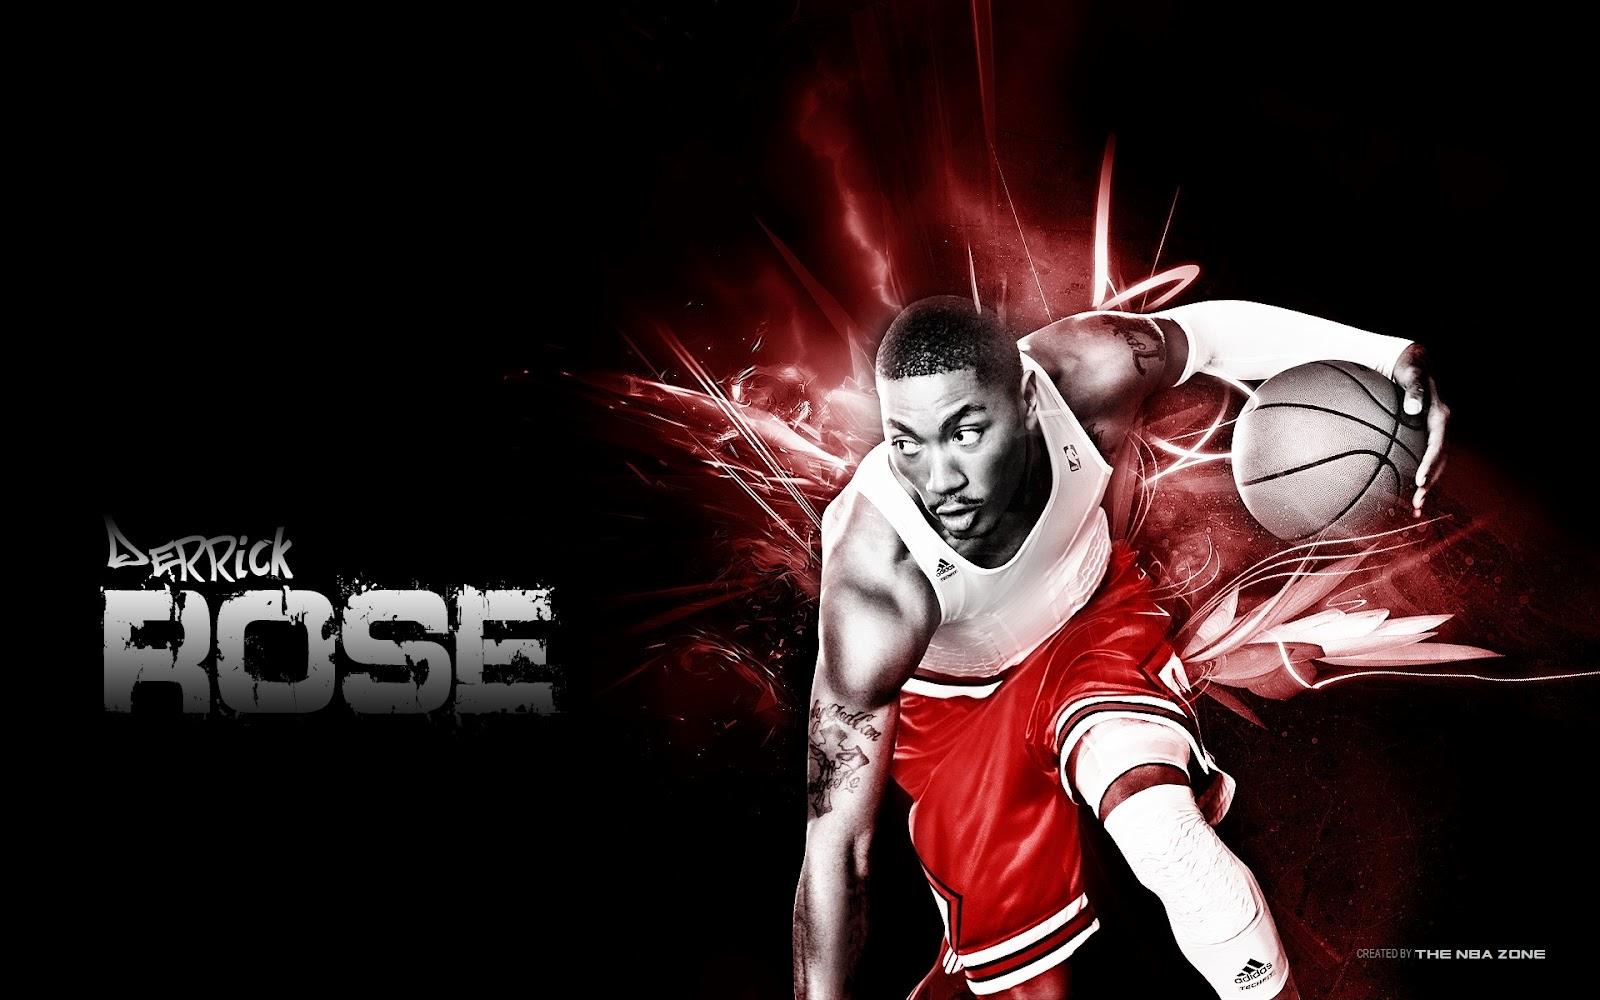 At just 23 Derrick Rose already has an MVP award a 95 million 1600x1000